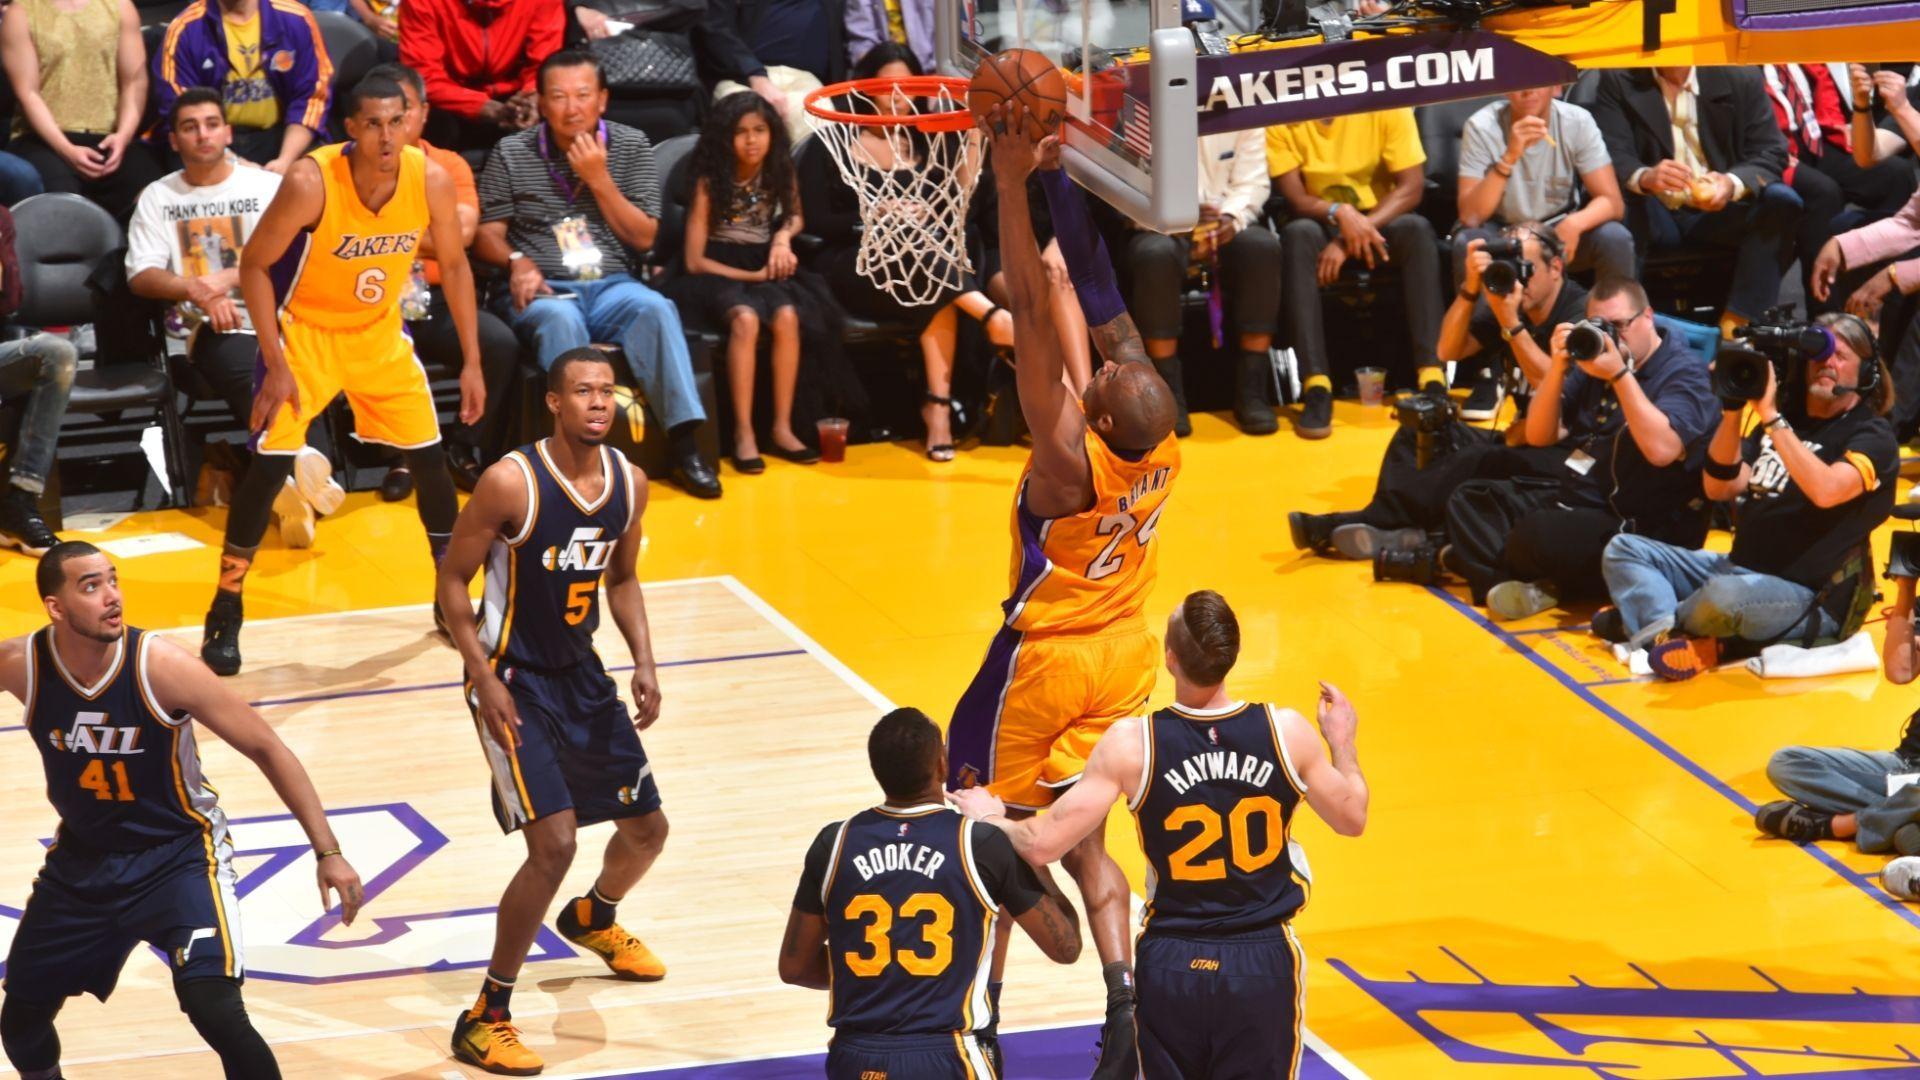 Watch Kobe Score 60 Points In Final Game Espn Video Nba Finals Kobe Espn